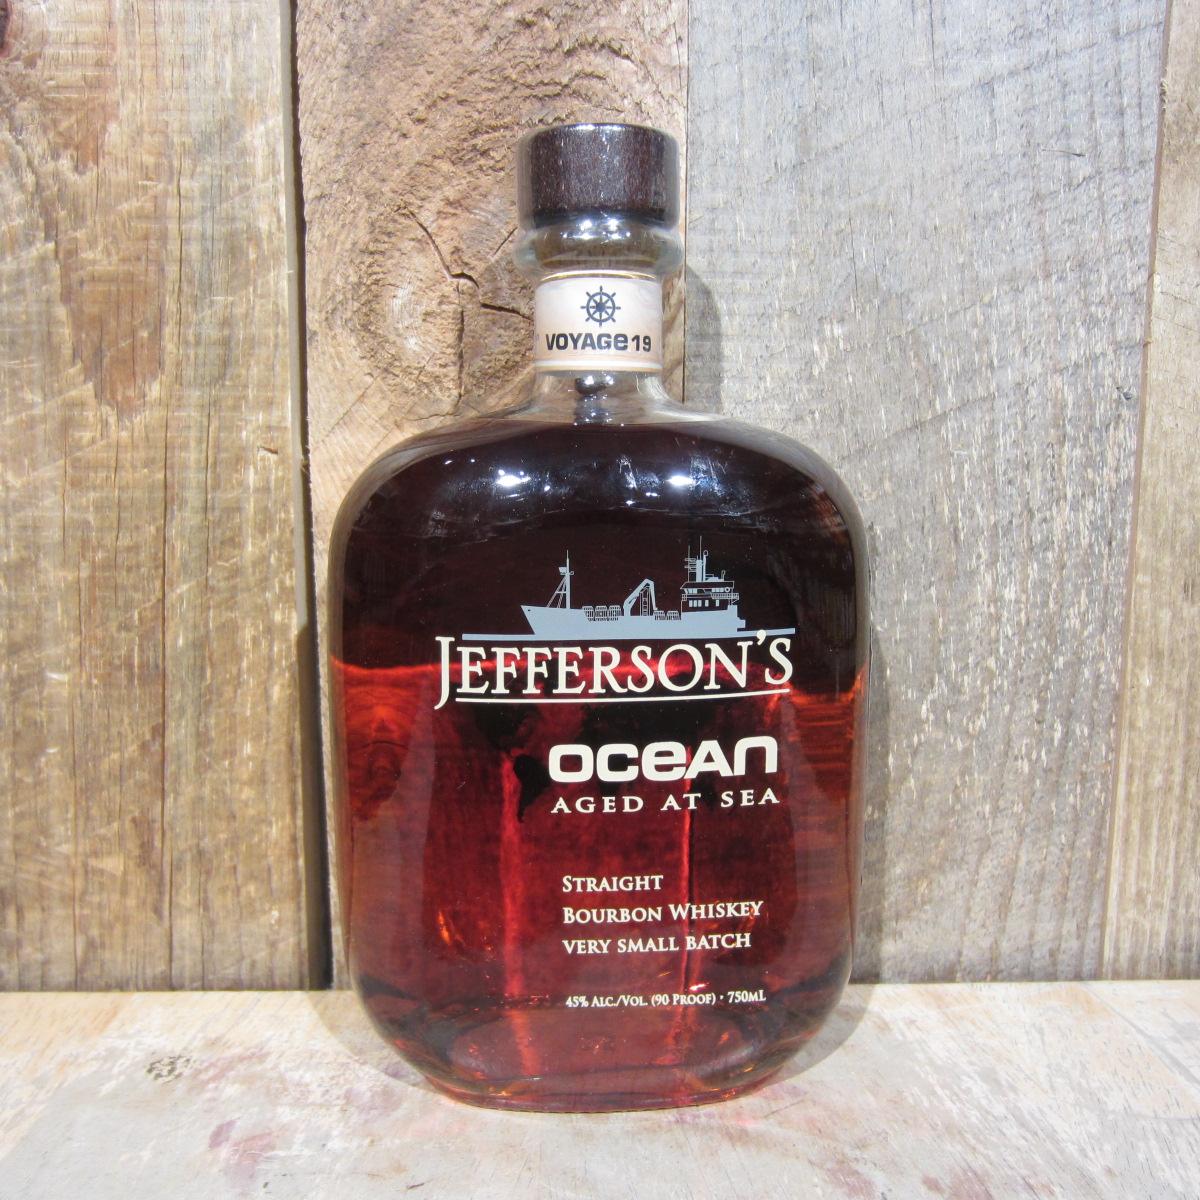 Jeffersons Bourbon Ocean Aged At Sea Voyage 20 750ml